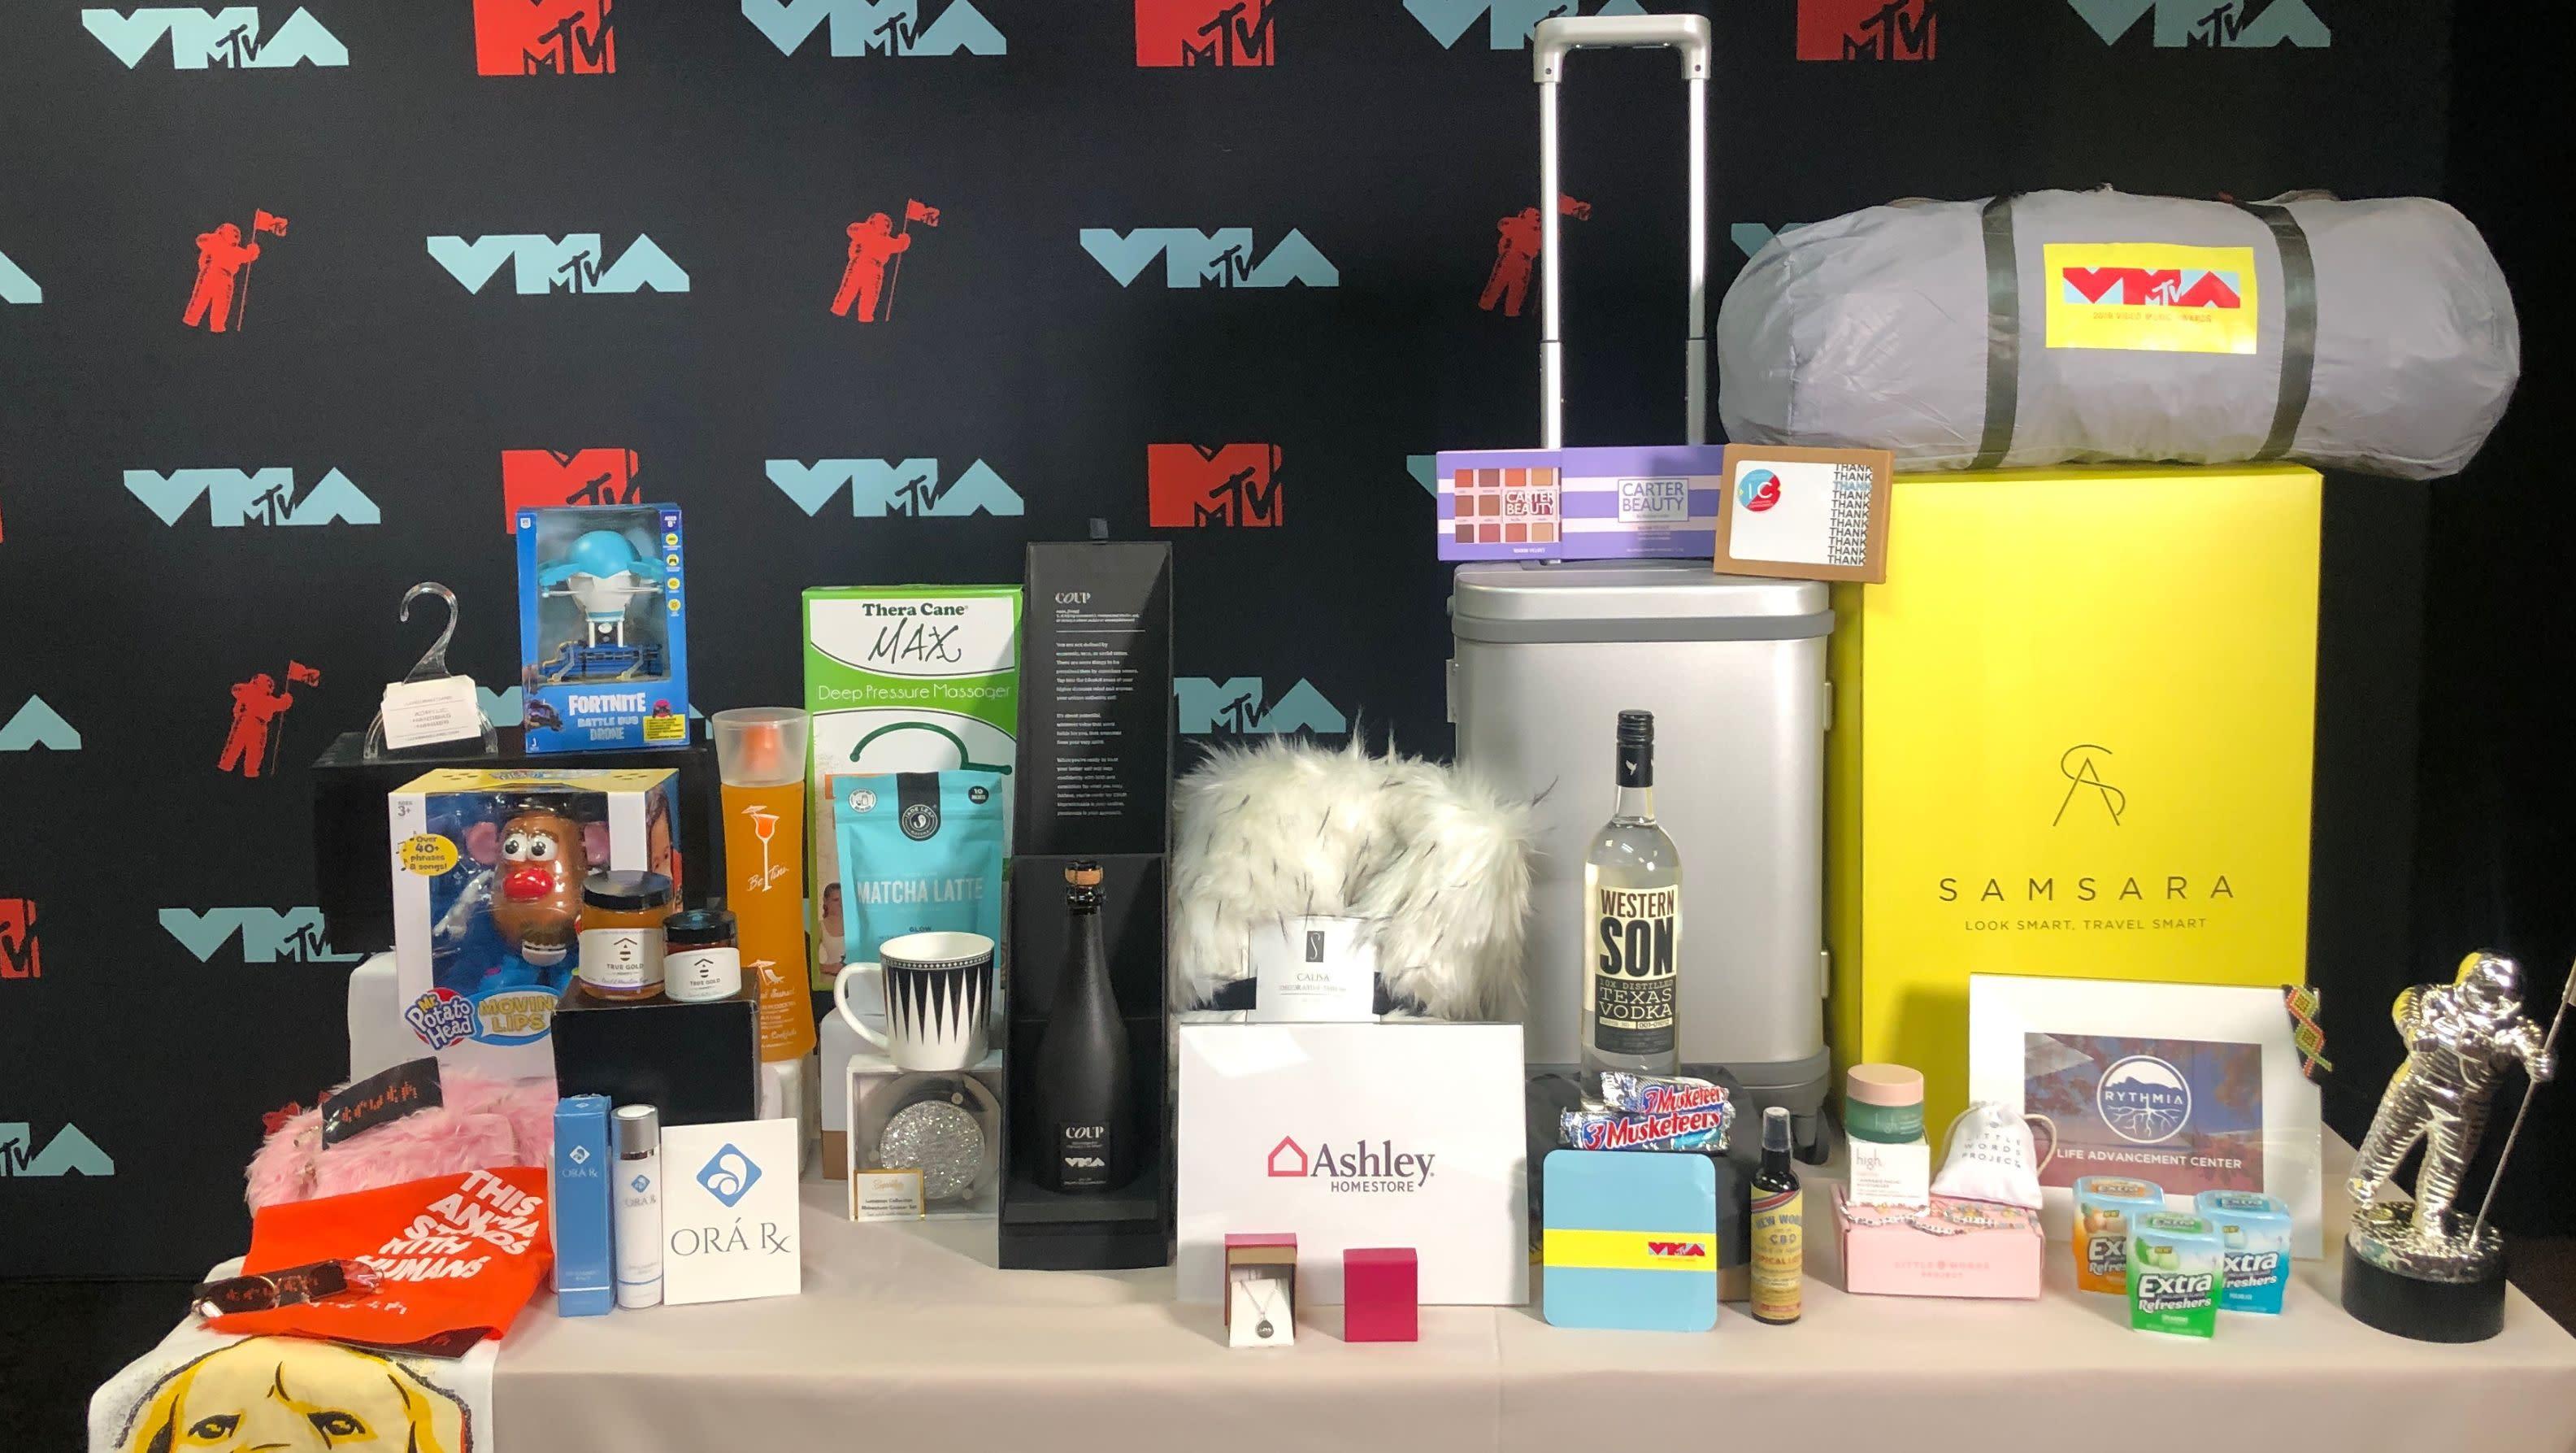 MTV VMA Swag Bag Includes CBD Products & 'Fortnite' Drones